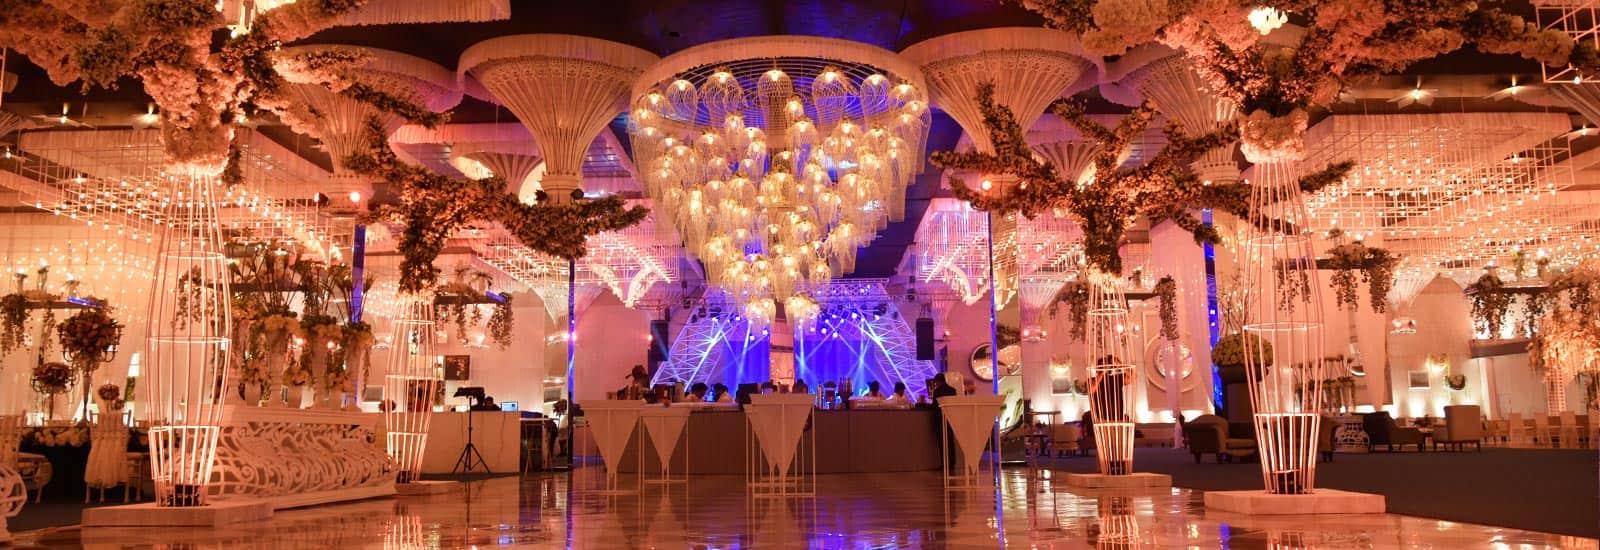 Udman wedding venue image